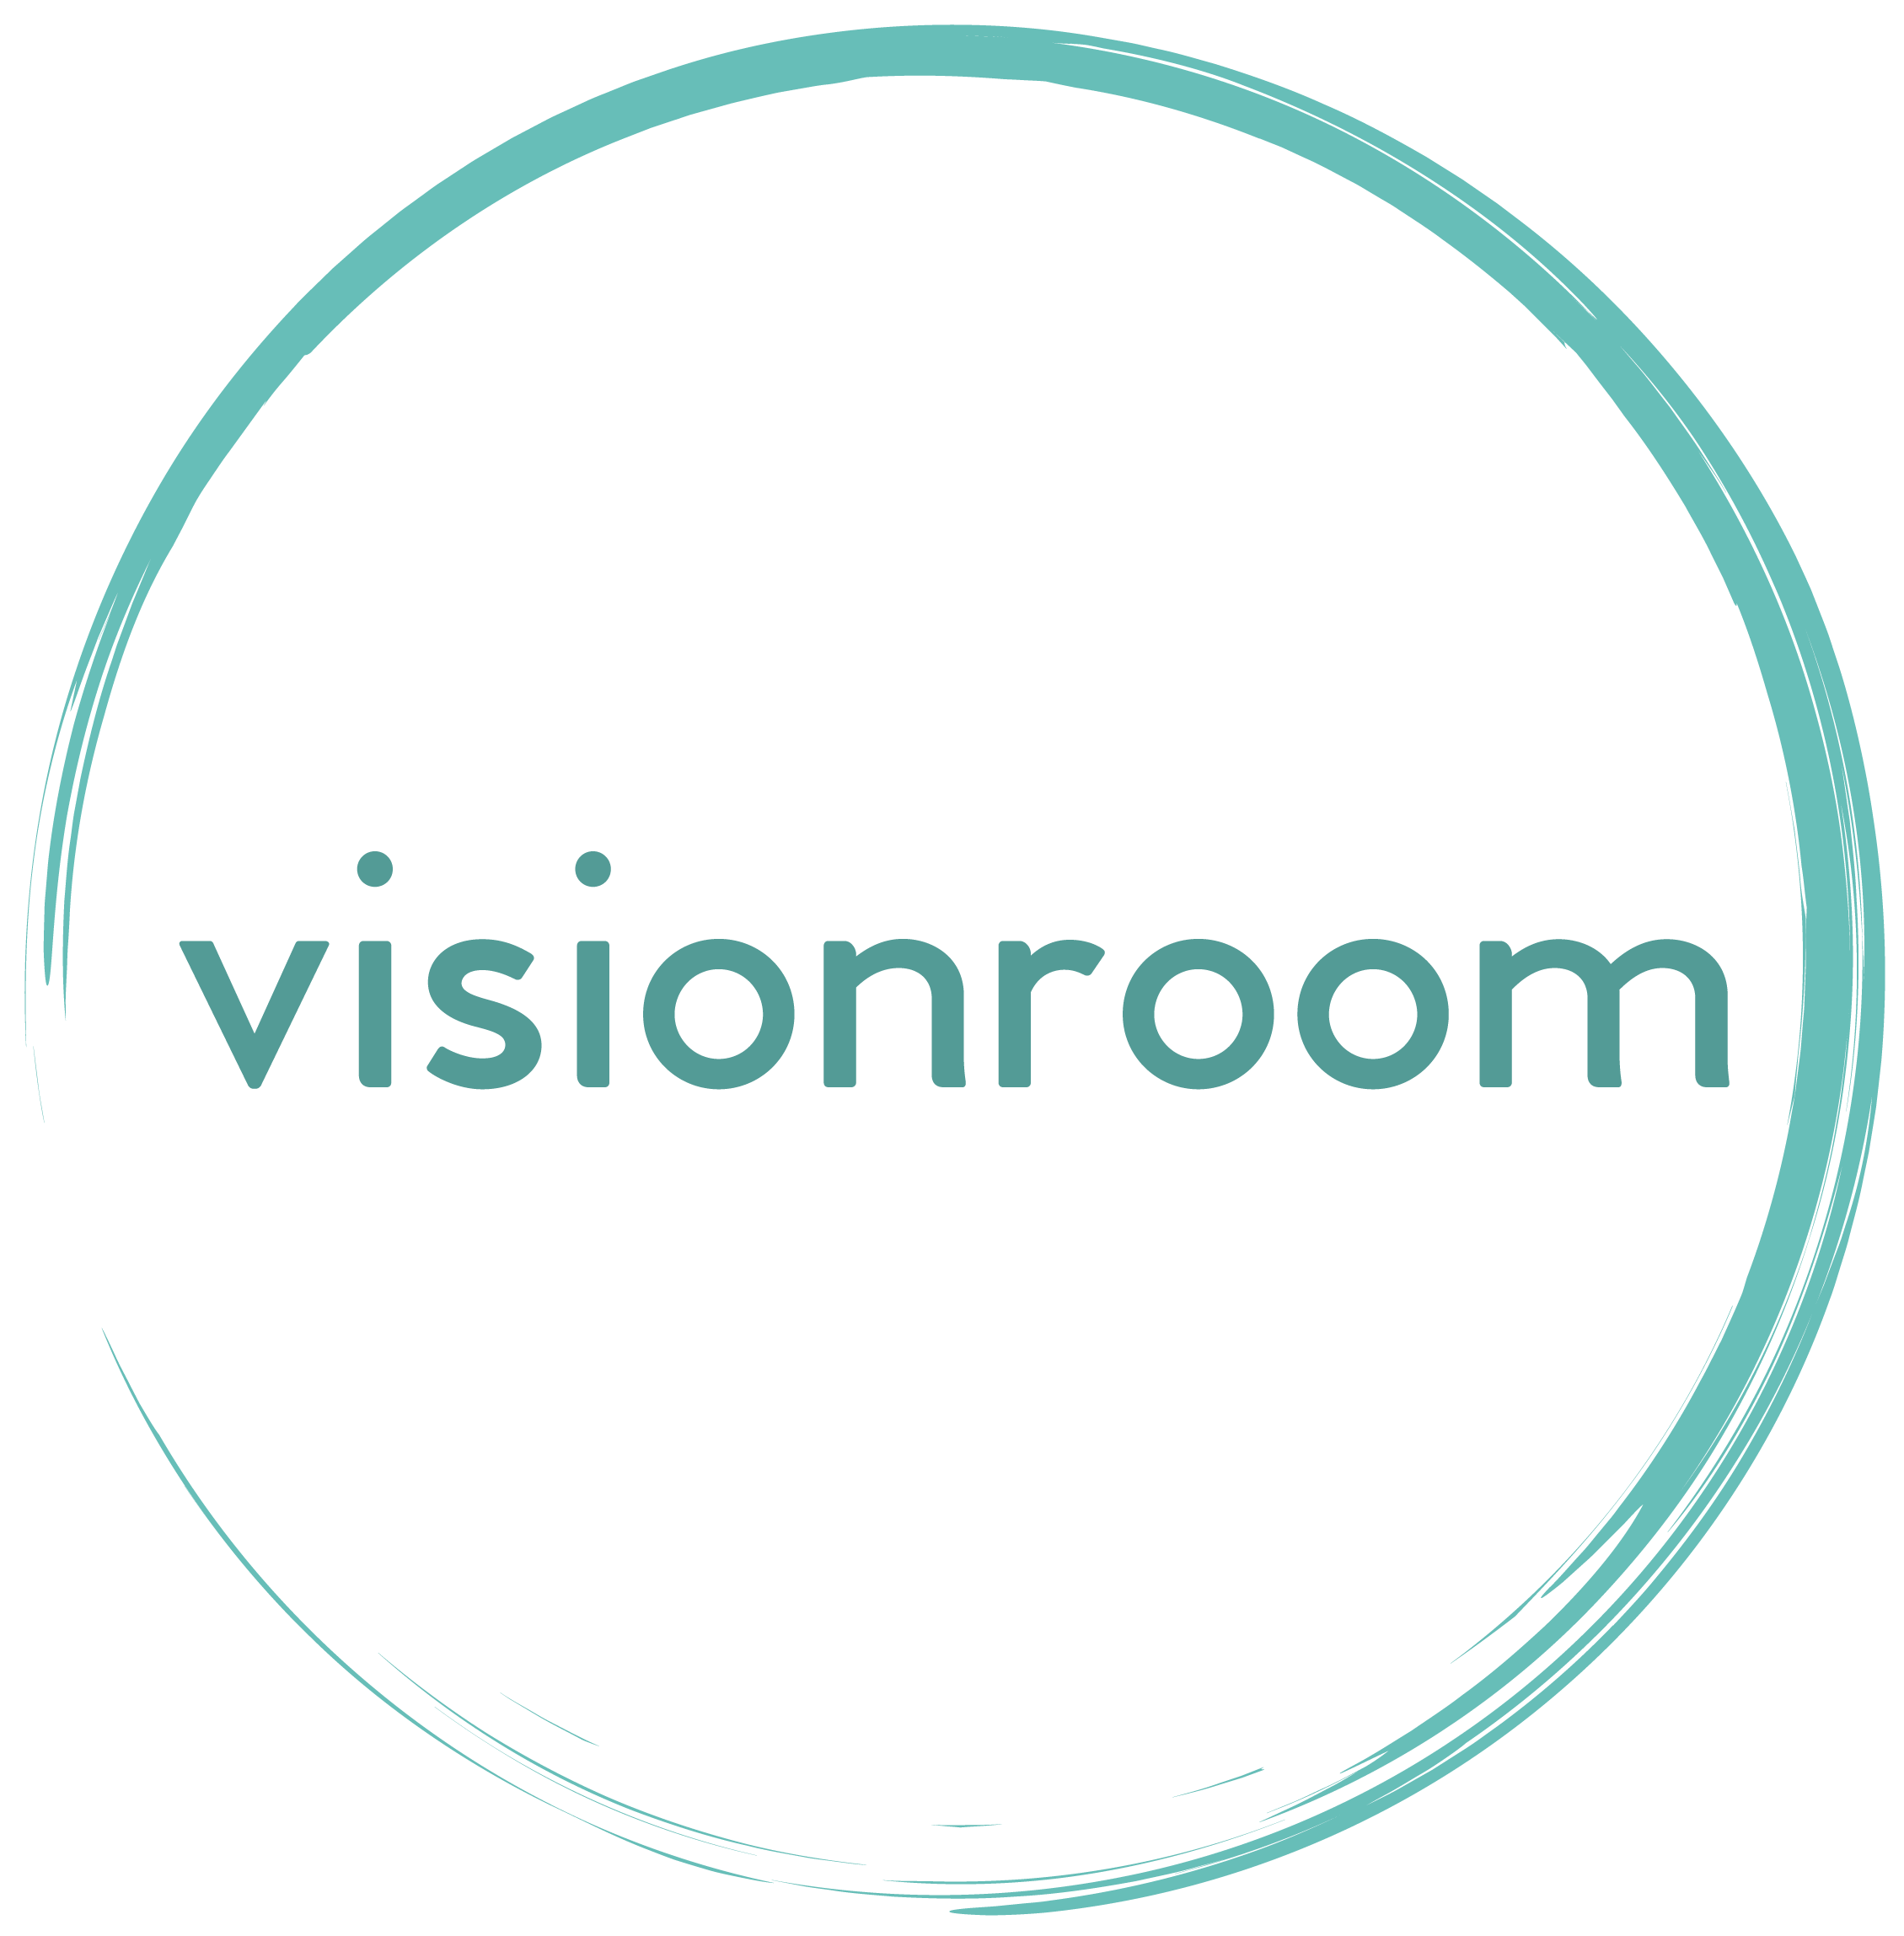 VisionroomDK